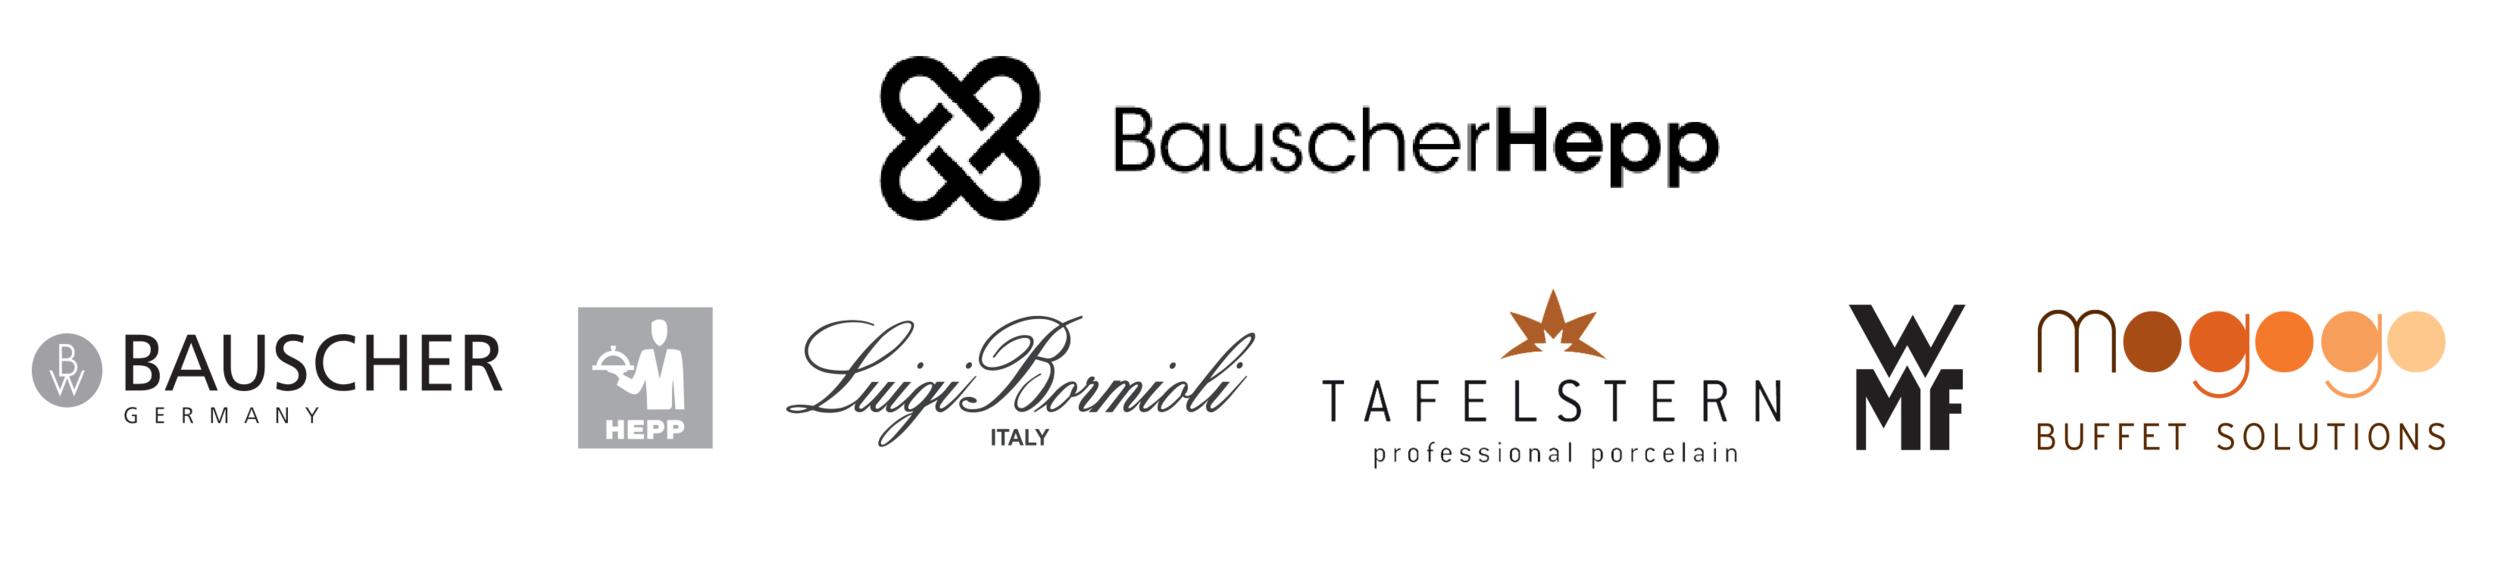 BauscherHepp_with_Brand_Logos COLOR.png